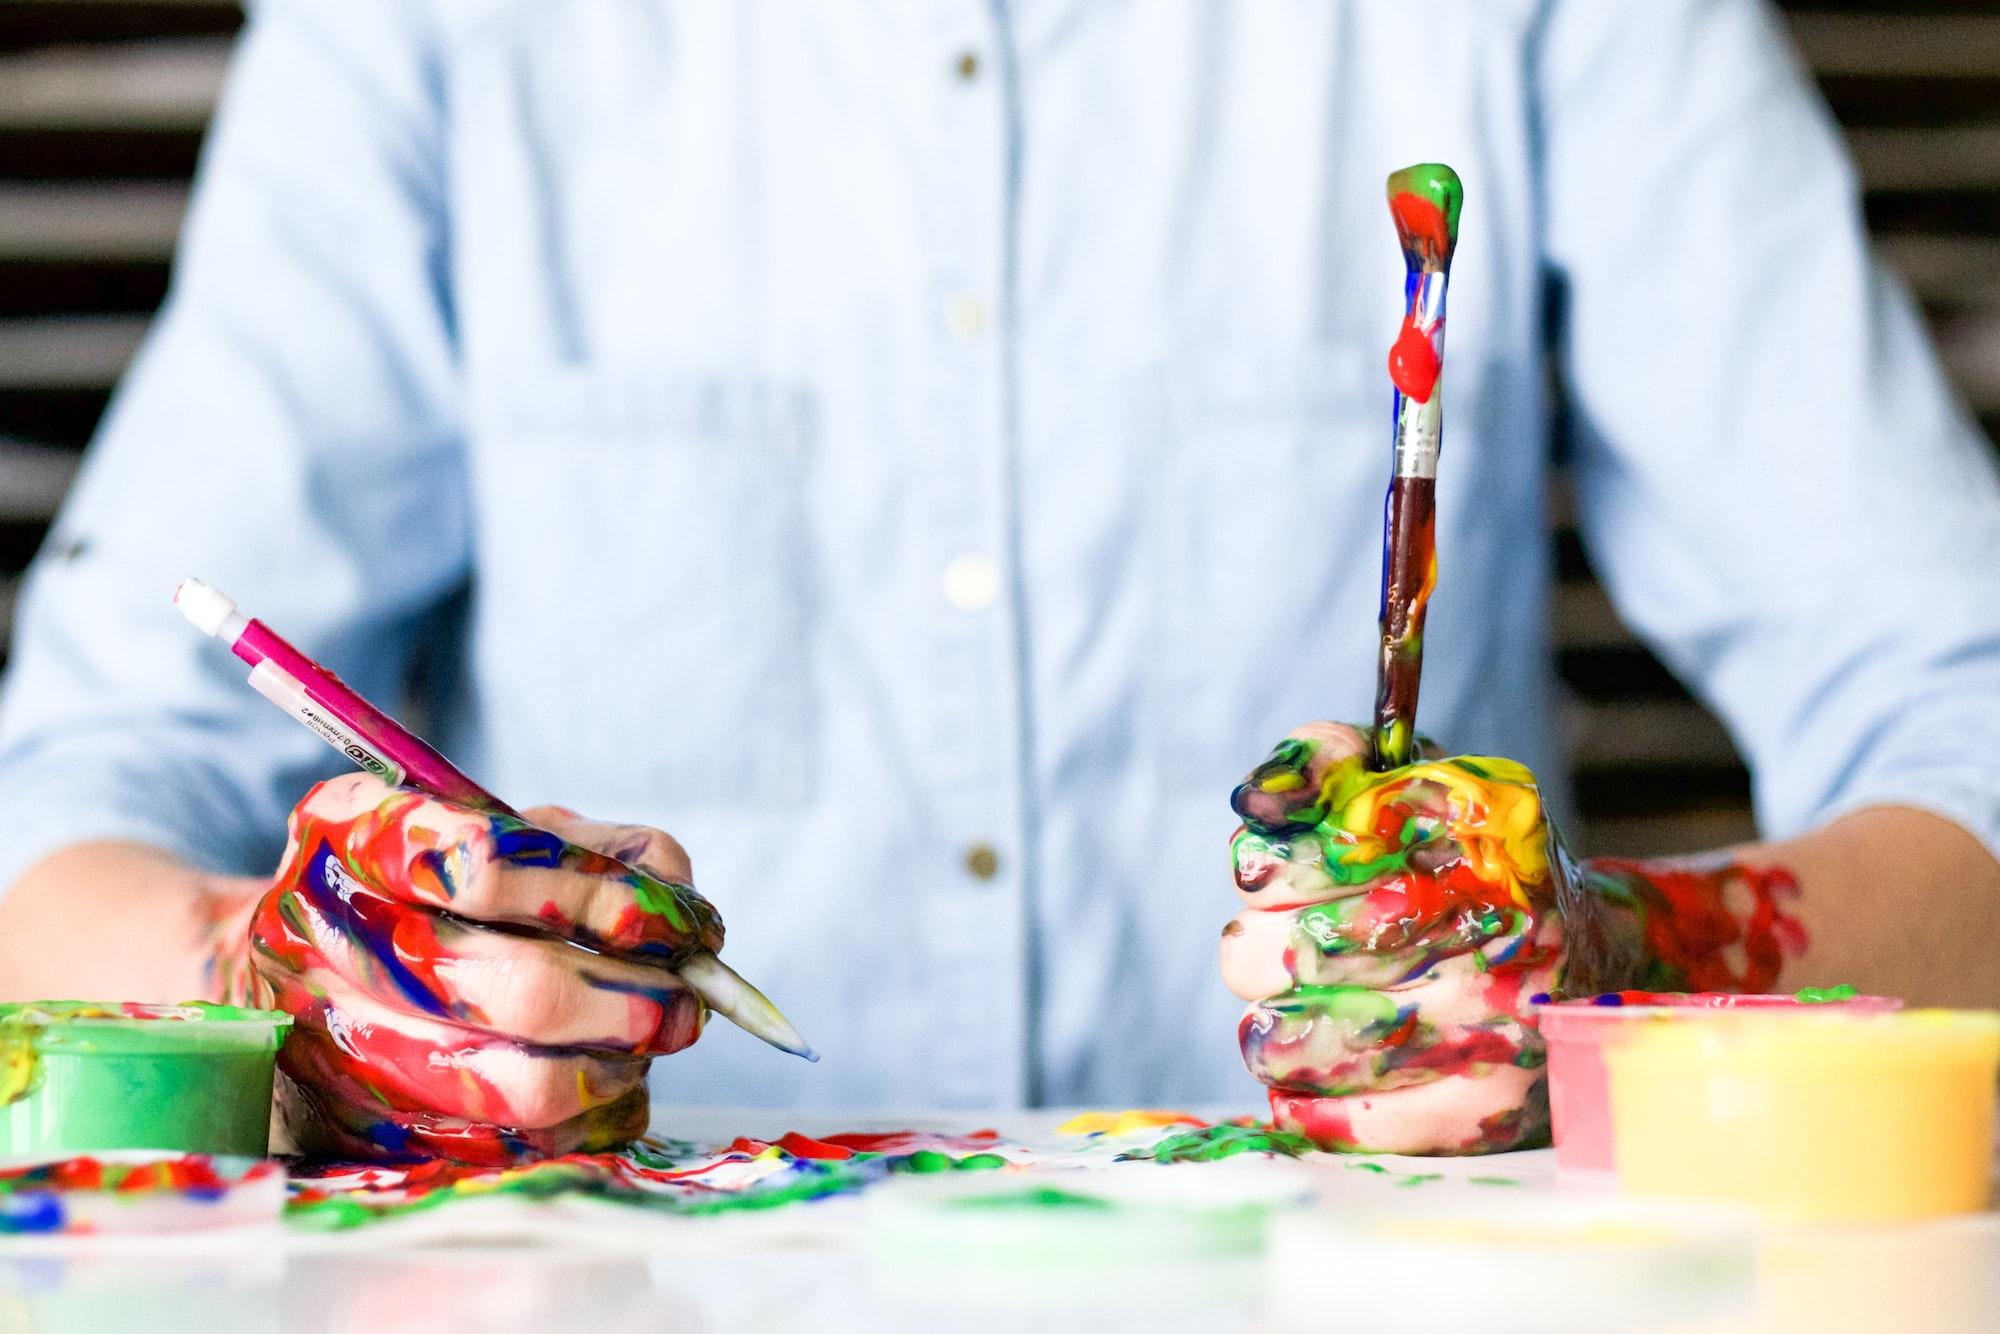 The Un-Creative Cultivating Creativity